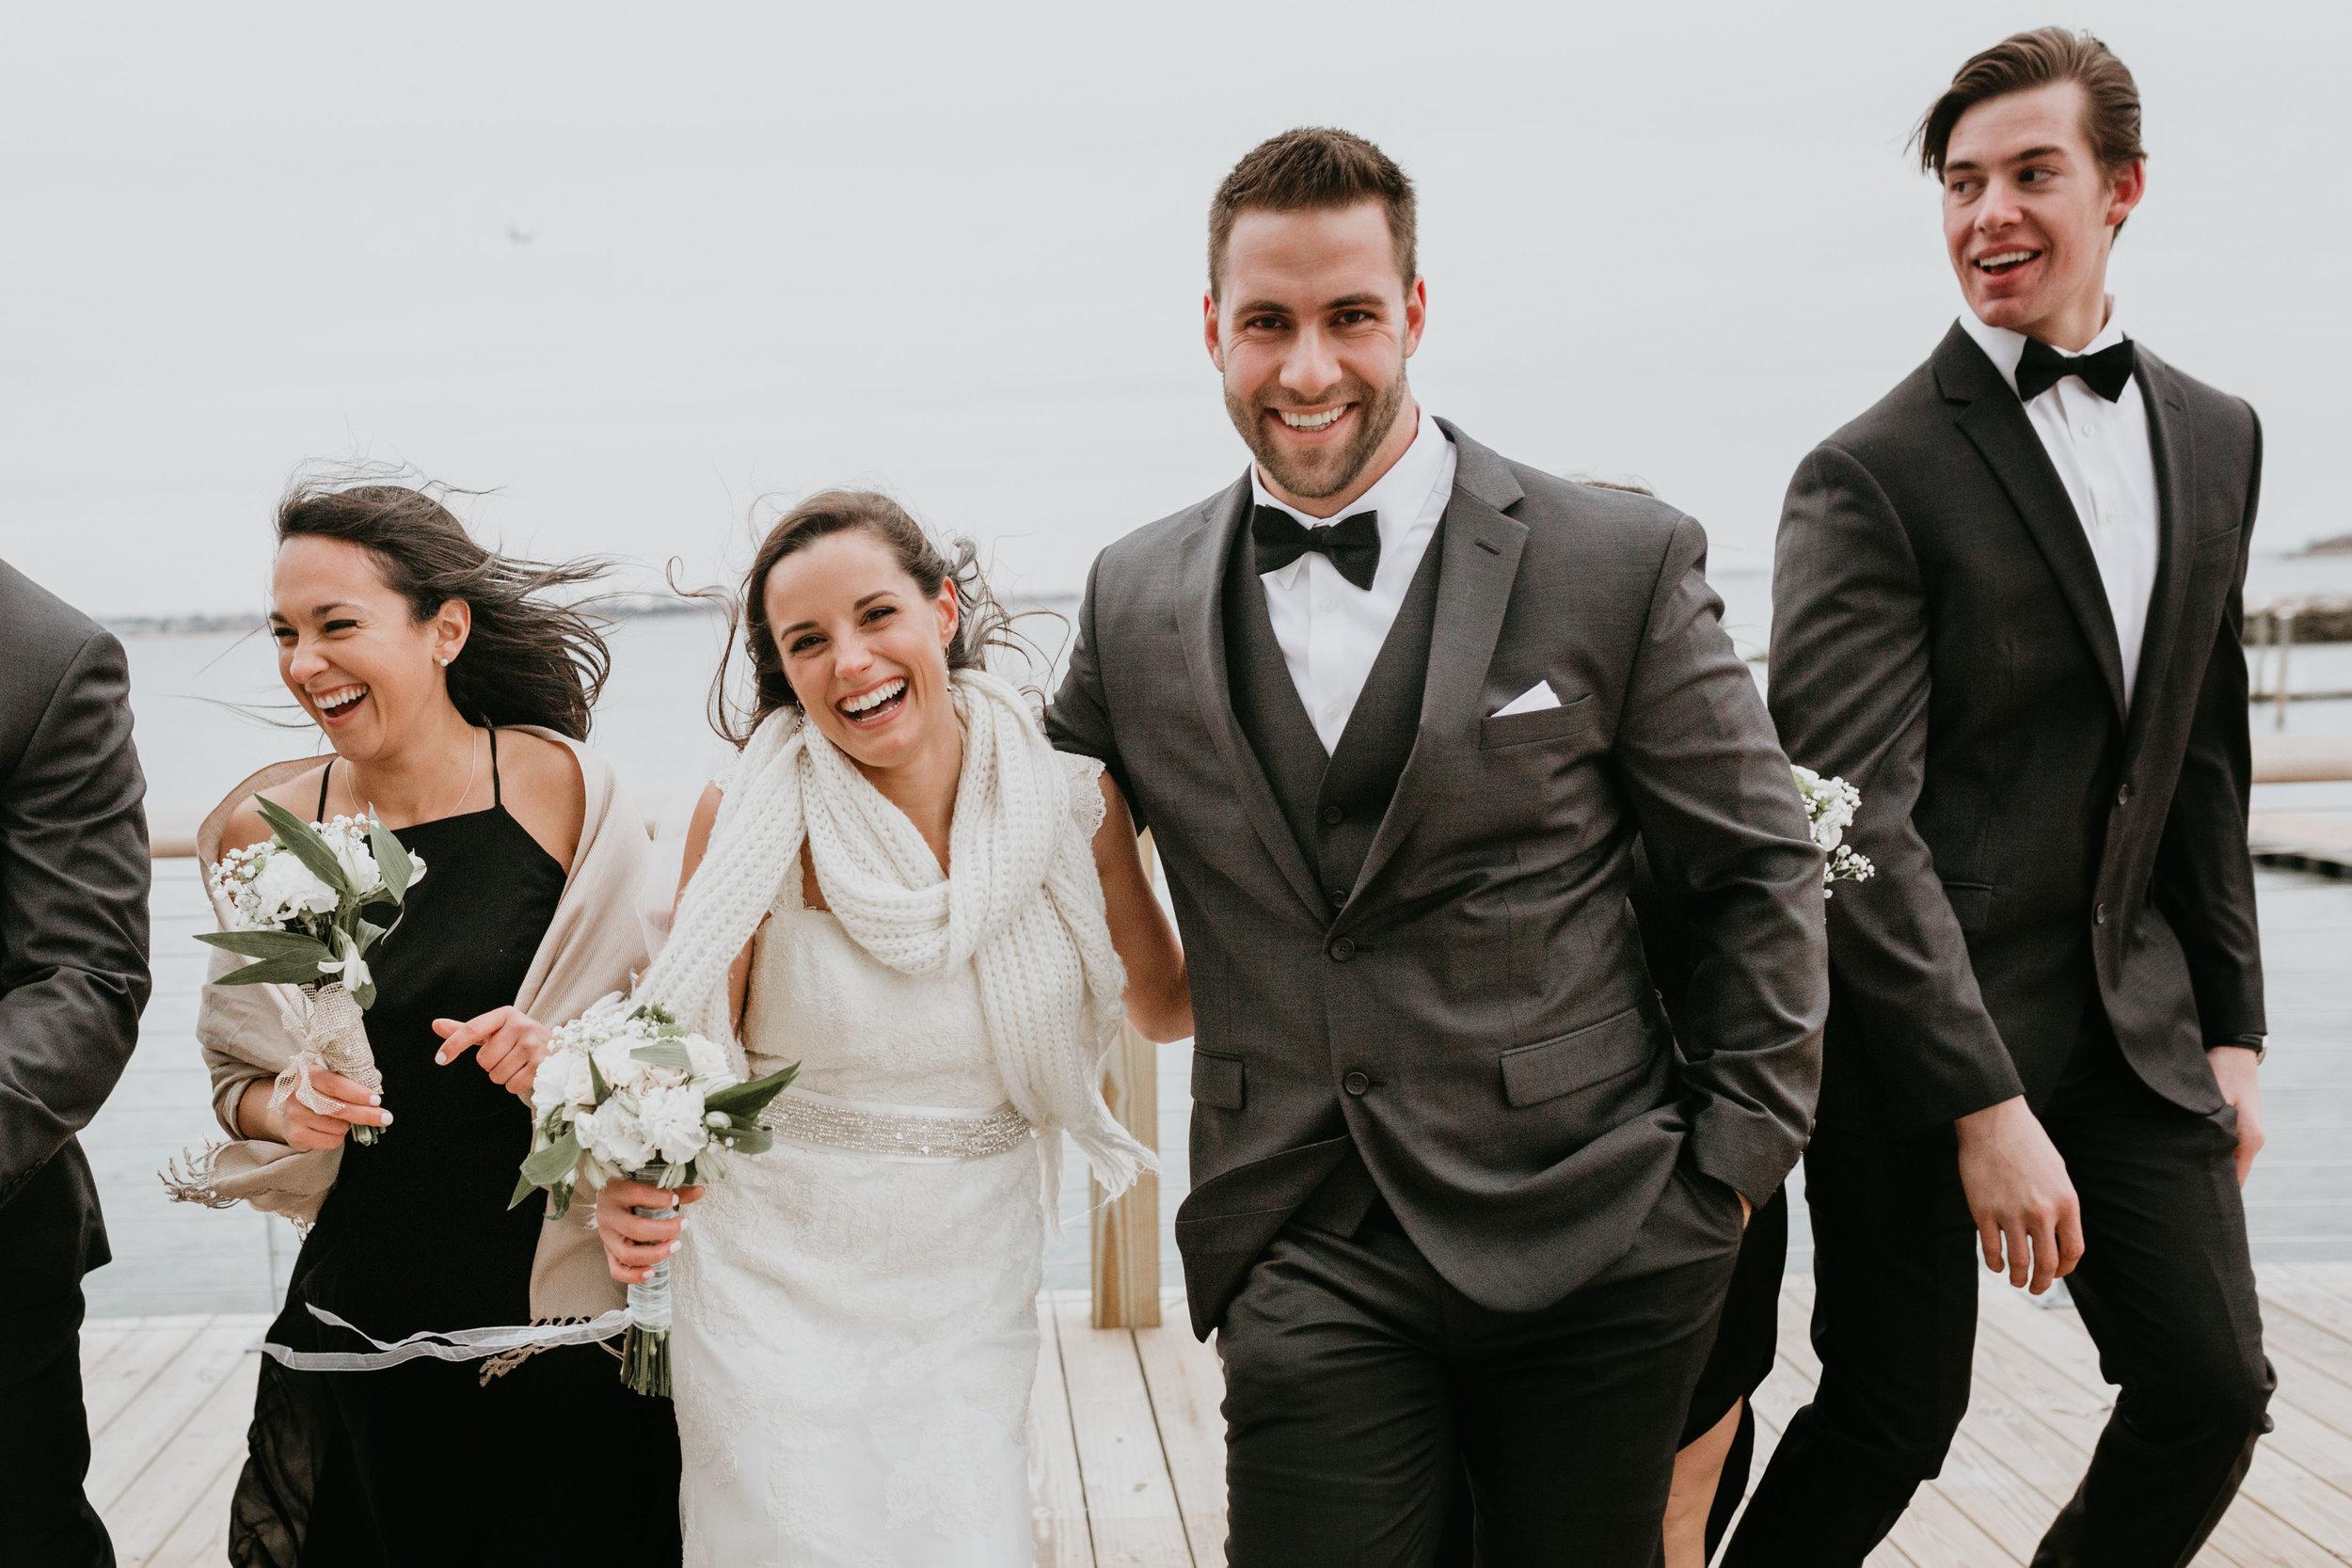 nicole-daacke-photography-boston-massachusetts-seaside-intimate-winter-wedding-photographer-34.jpg